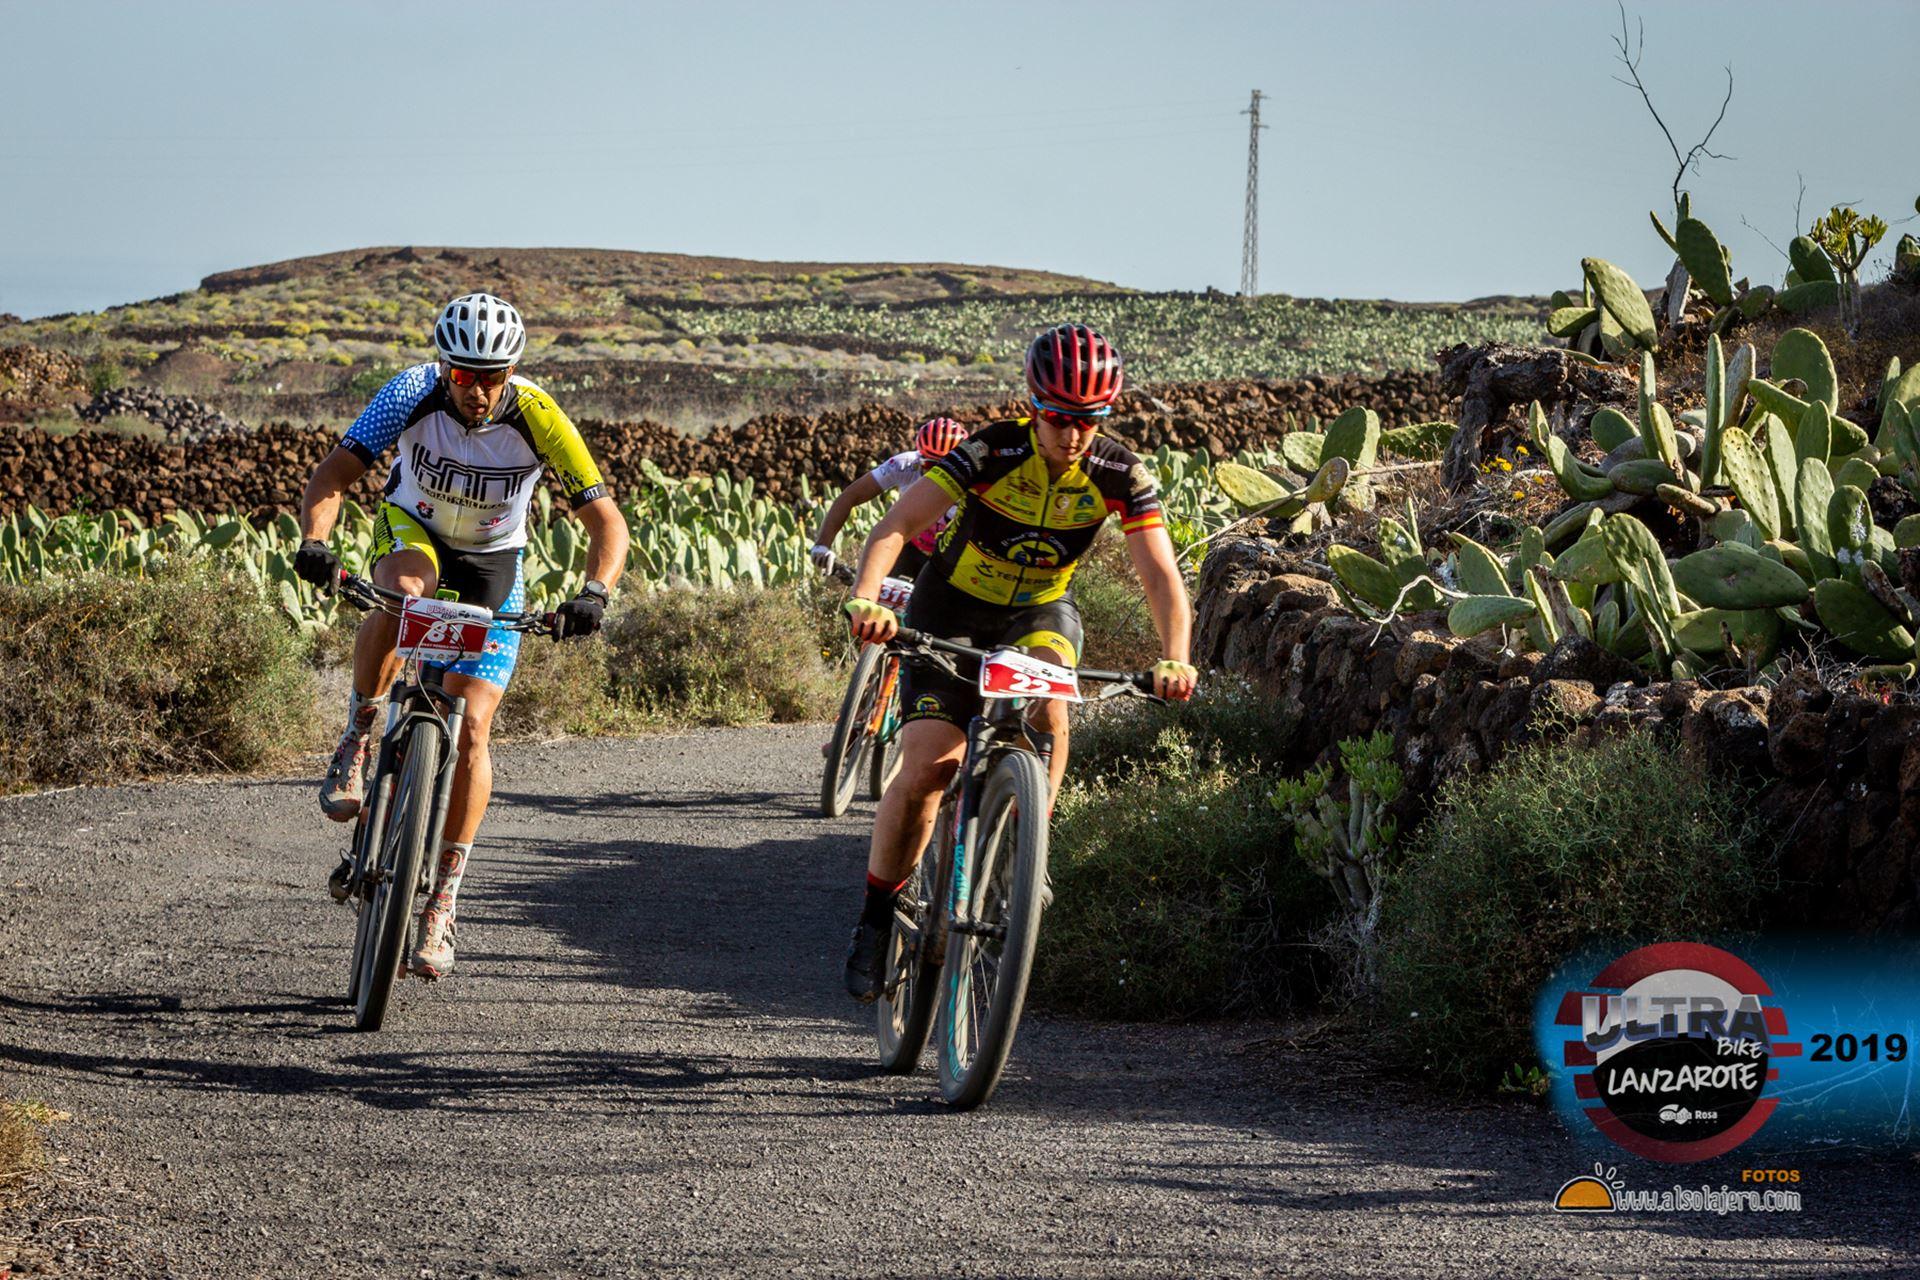 Sector Guatiza 2ª Etapa Ultrabike 2019 Fotos Alsolajero.com-44